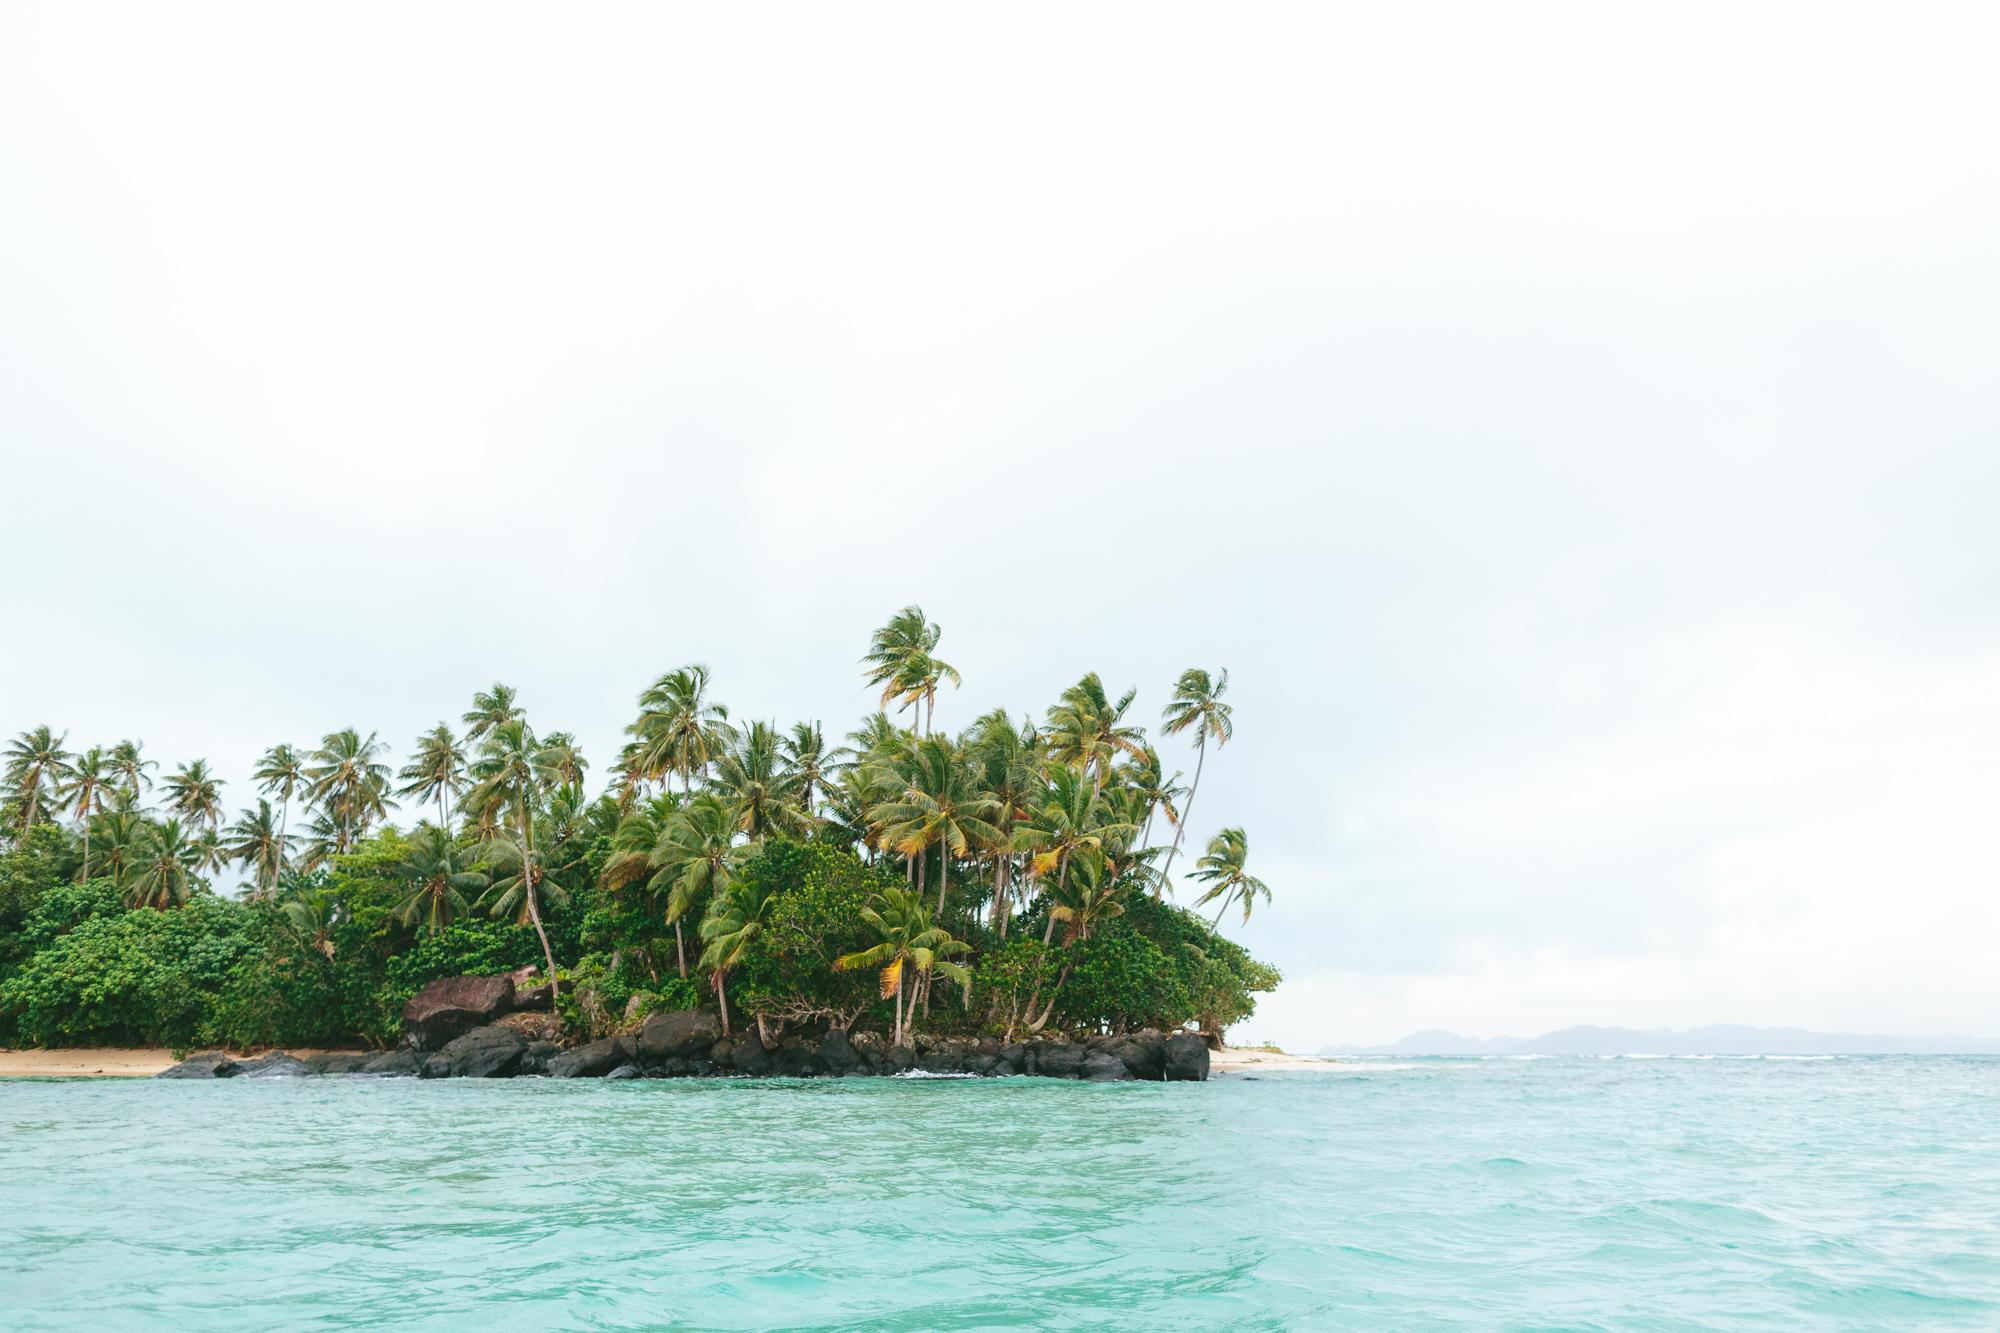 Castaway Kioa Beaches - Fiji Island Resort - The Remote Resort, Fiji Islands